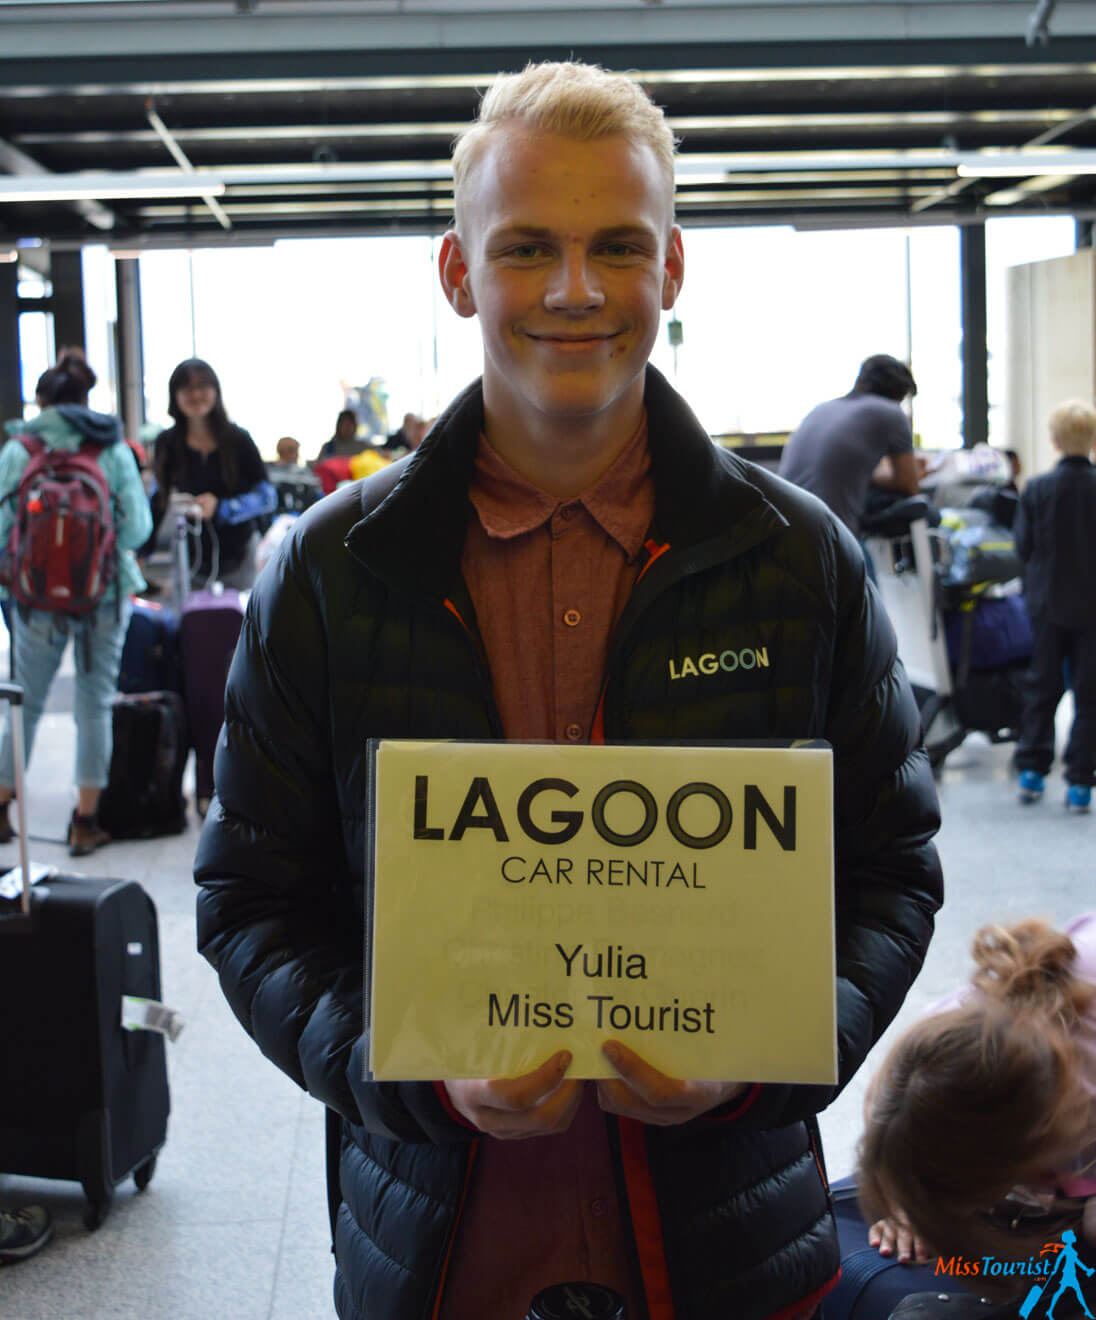 Lagoon car rental welcome airport2